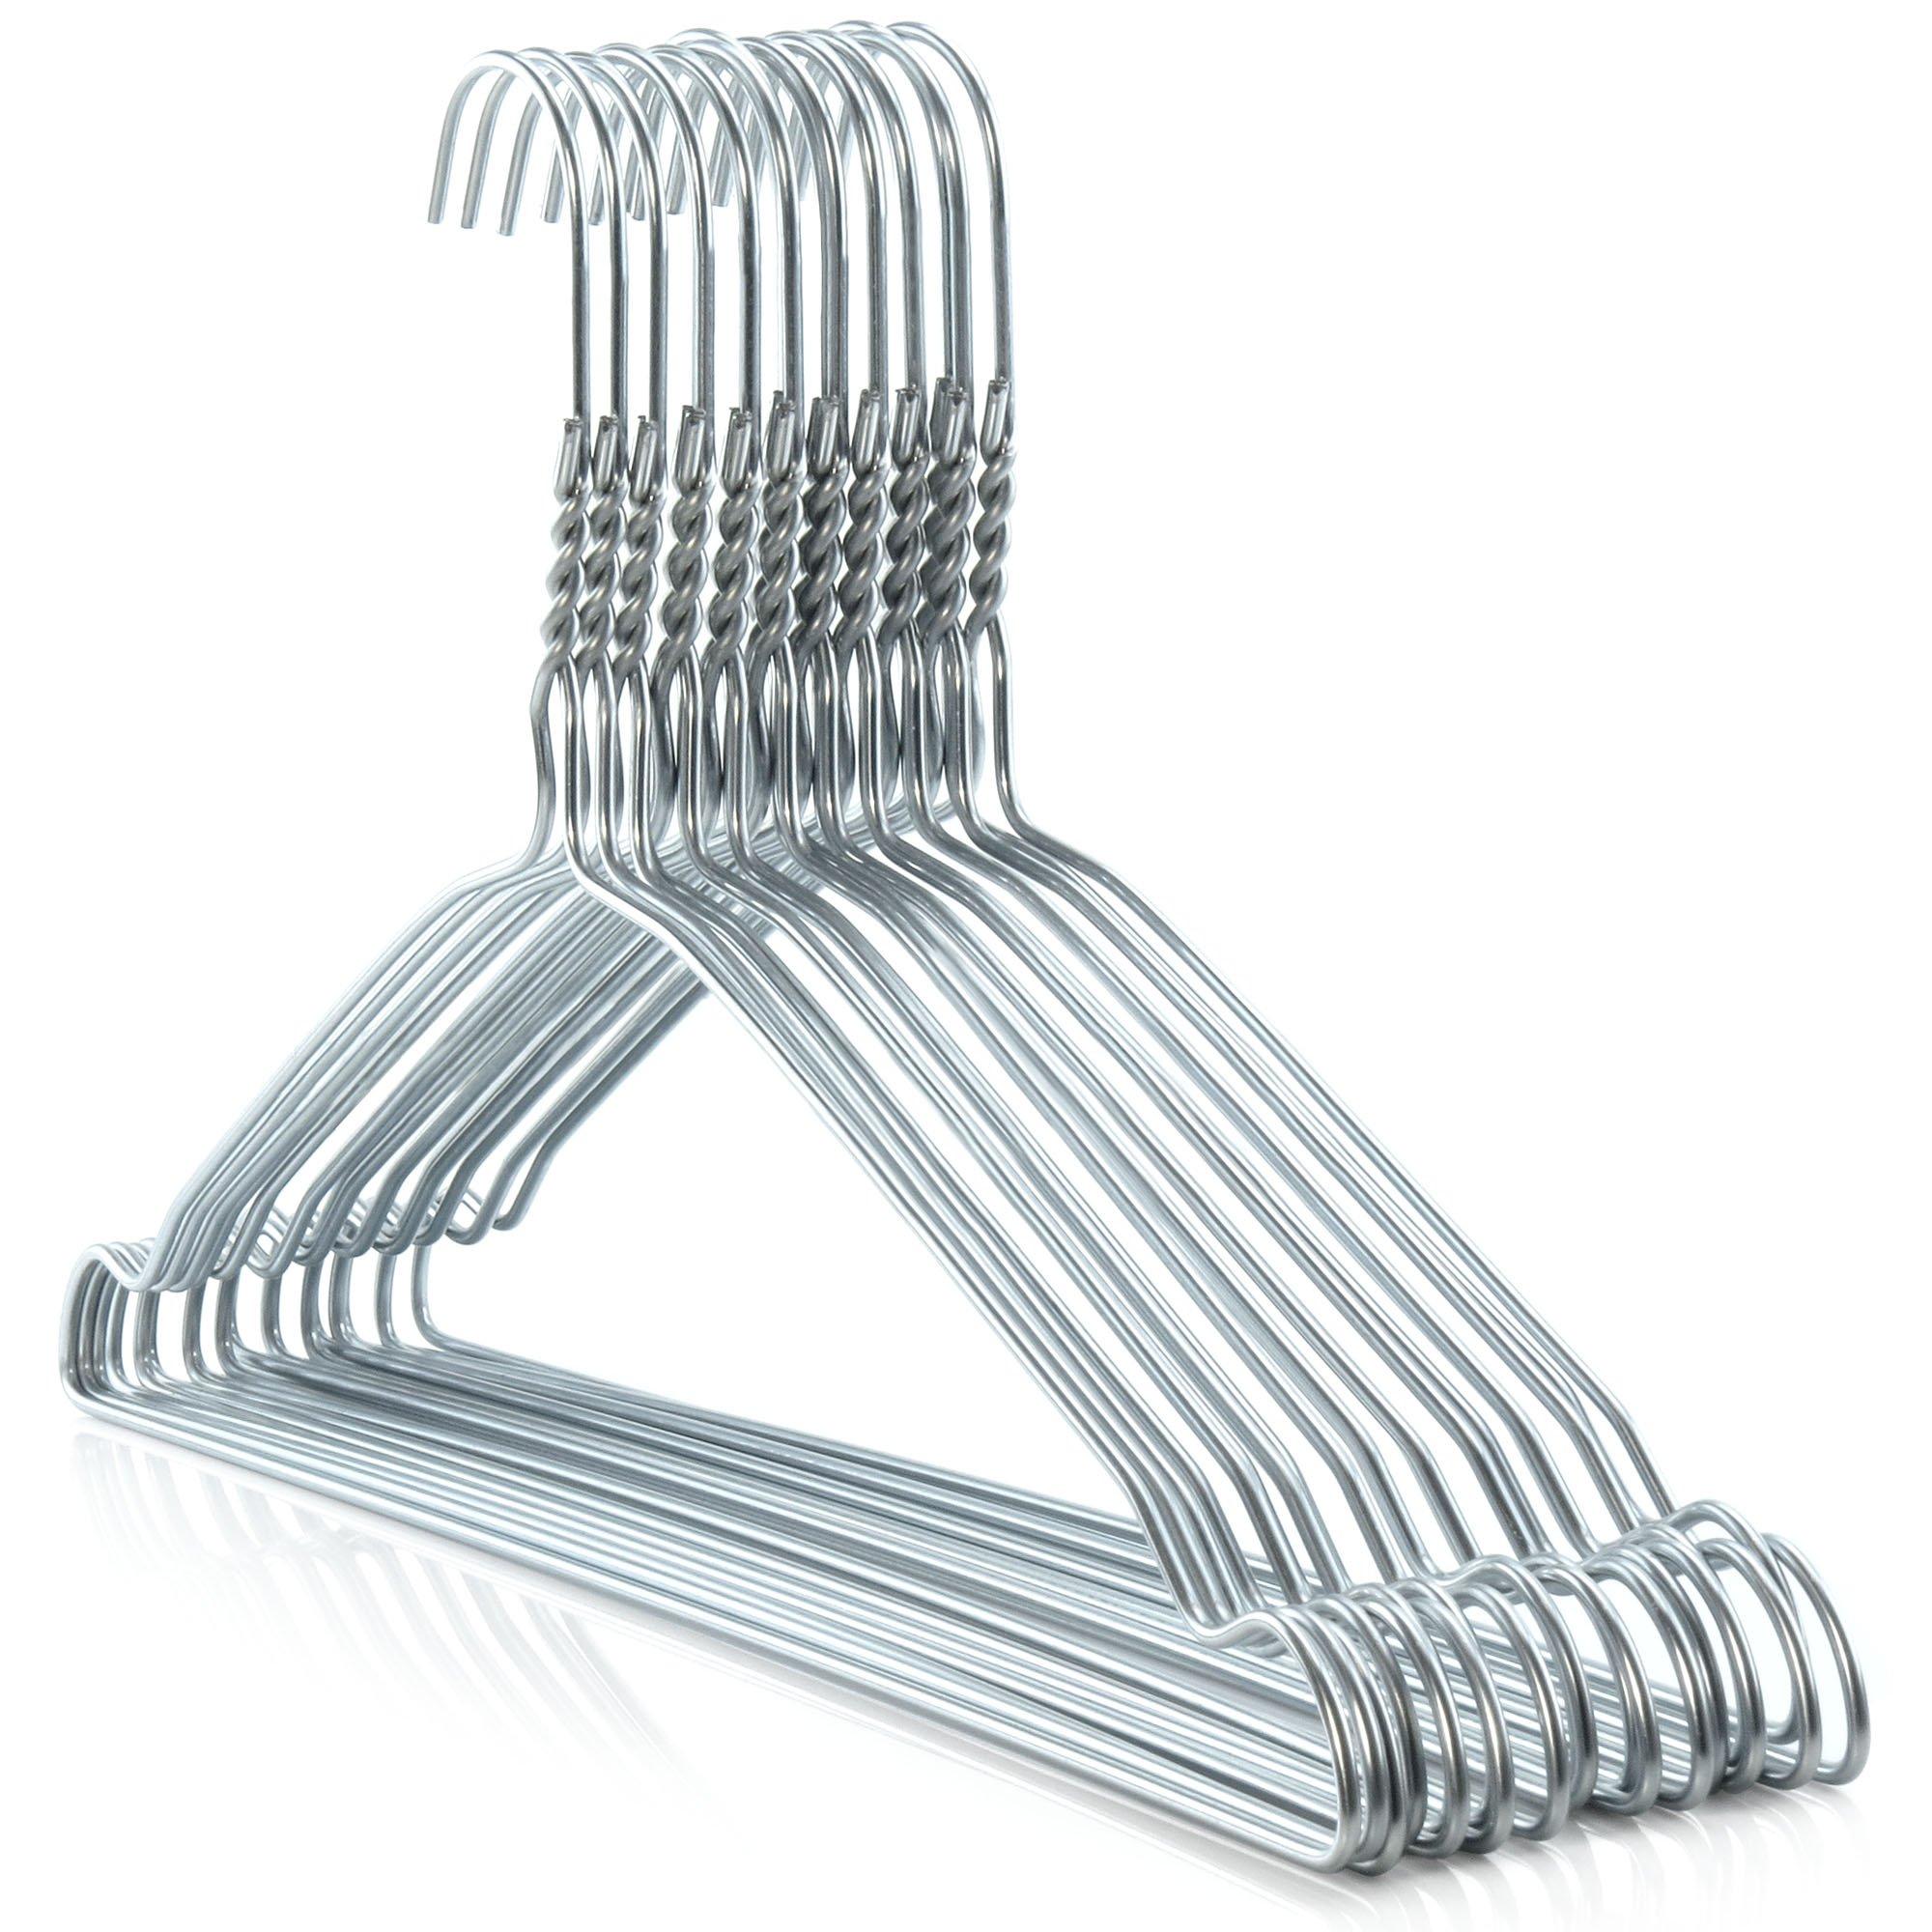 HANGERWORLD 100 Silver 16inch Metal 10 Gauge Wire Remat Pants Bar Coat Clothes Garment Hangers Notched